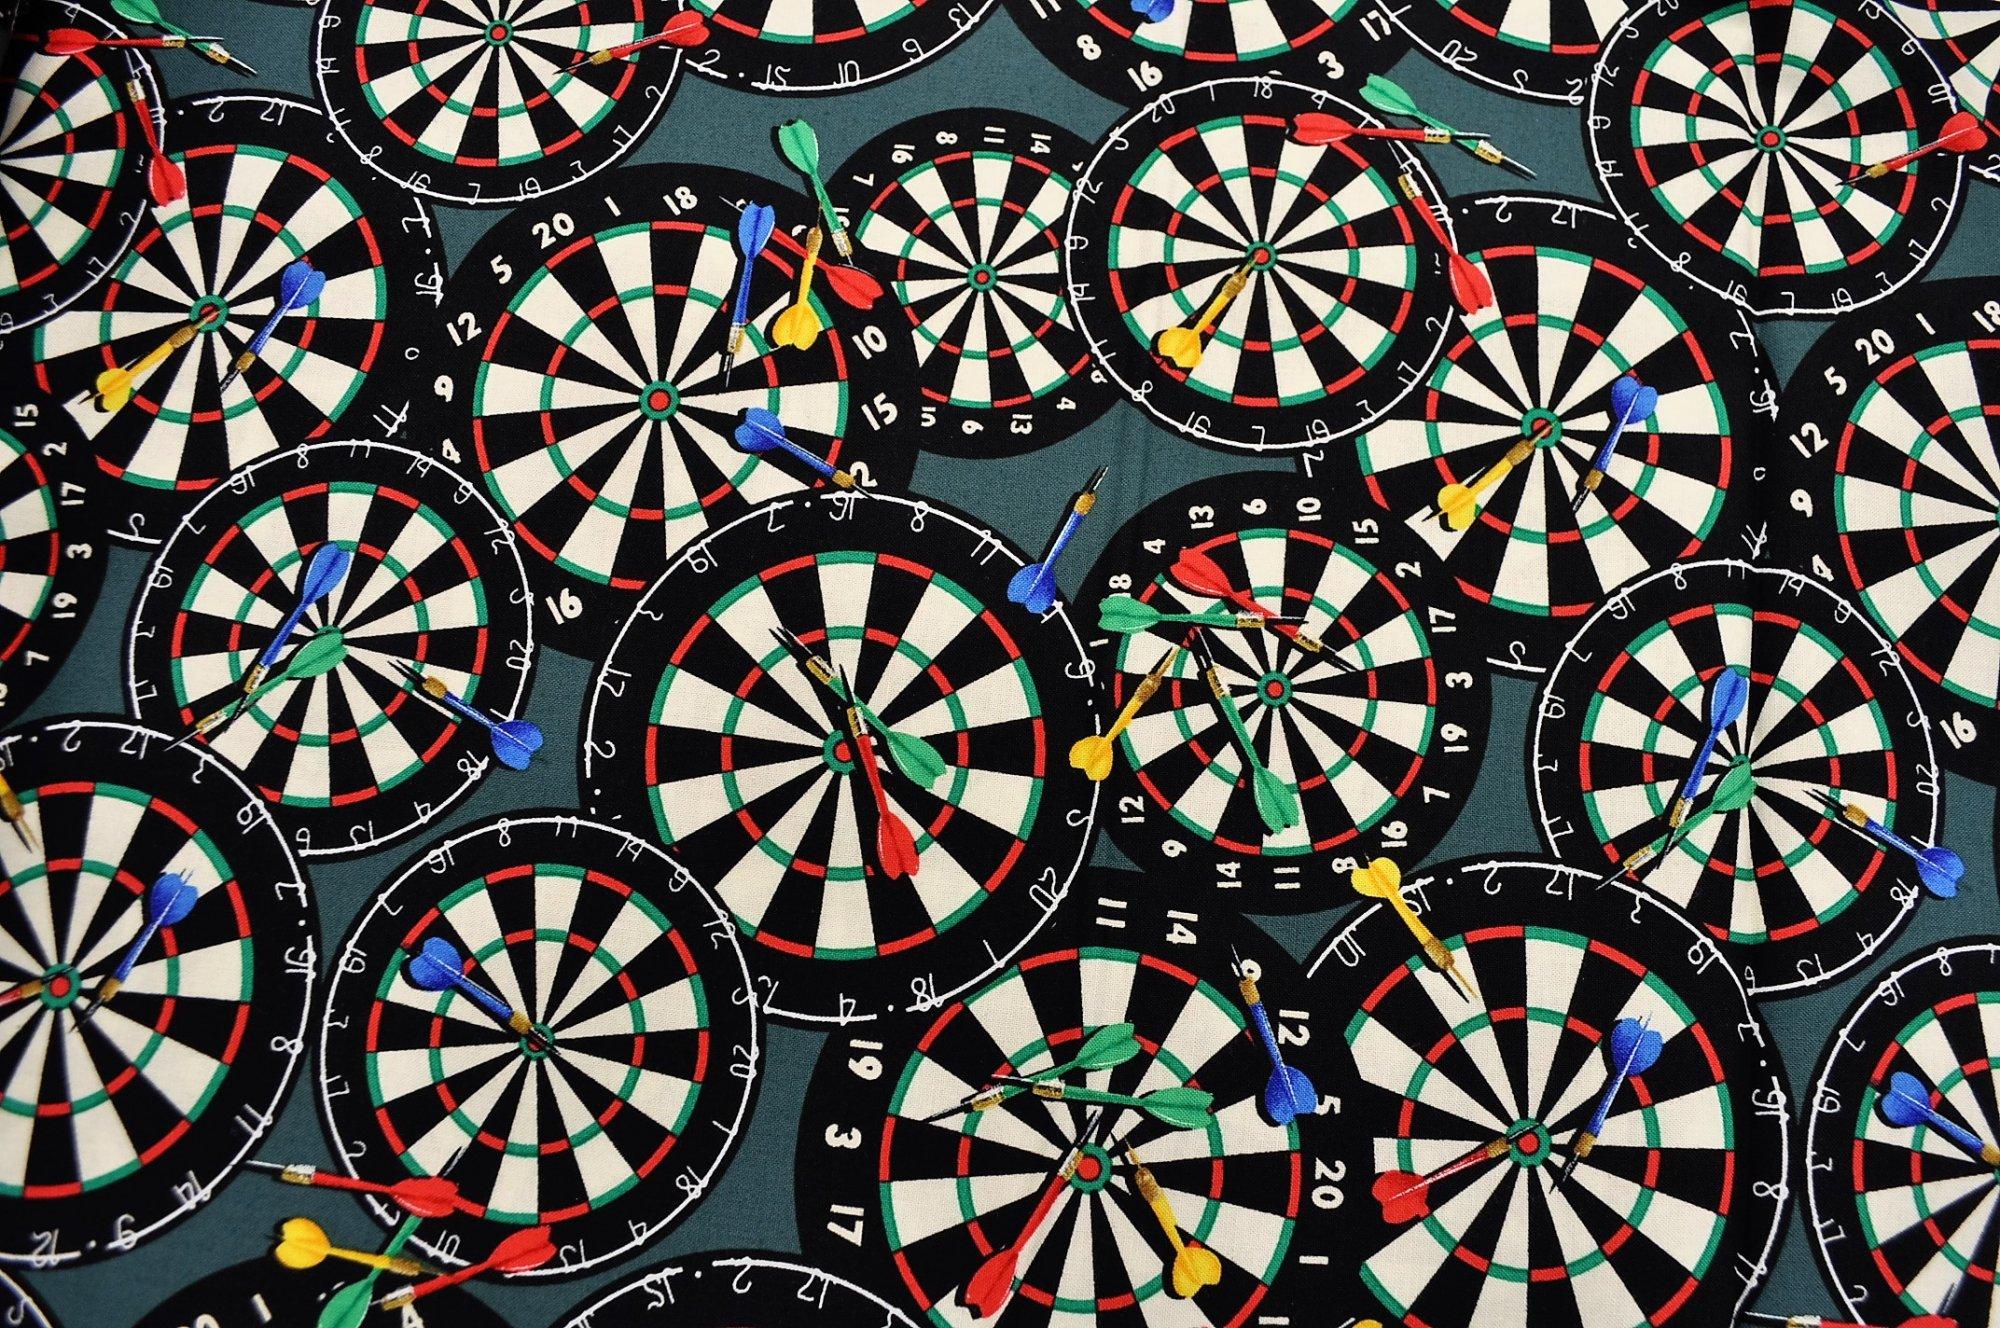 Games People Play Darts 05995-40